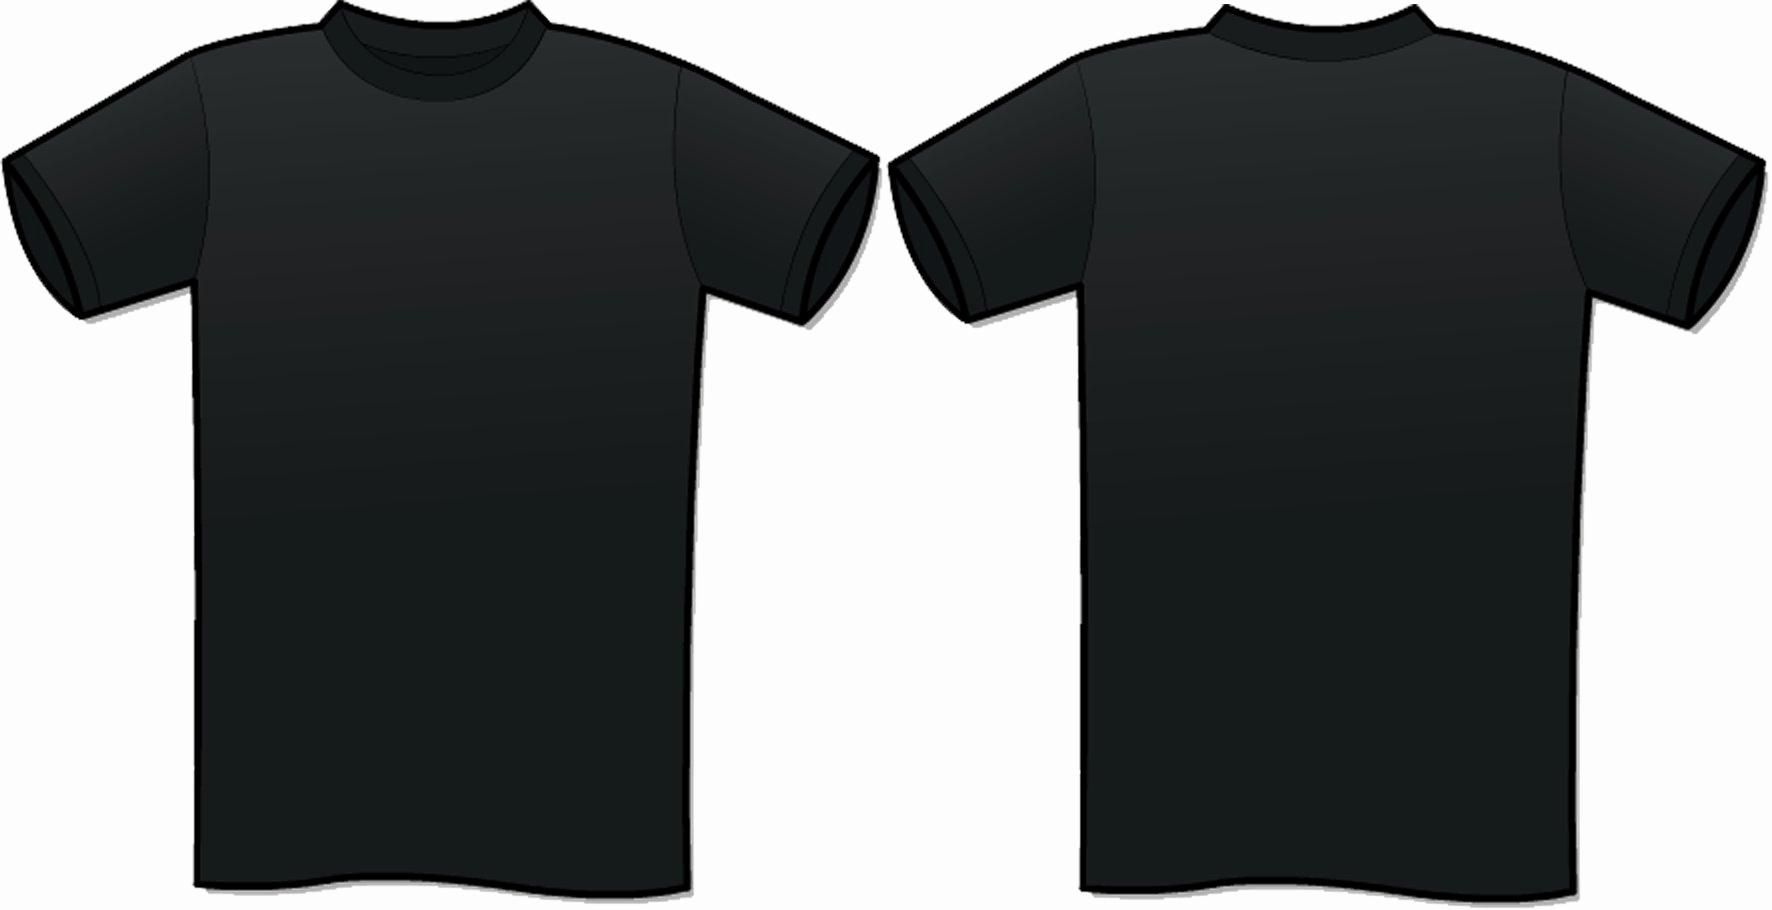 Free T Shirt Template Fresh Free Tshirt Template Download Free Clip Art Free Clip